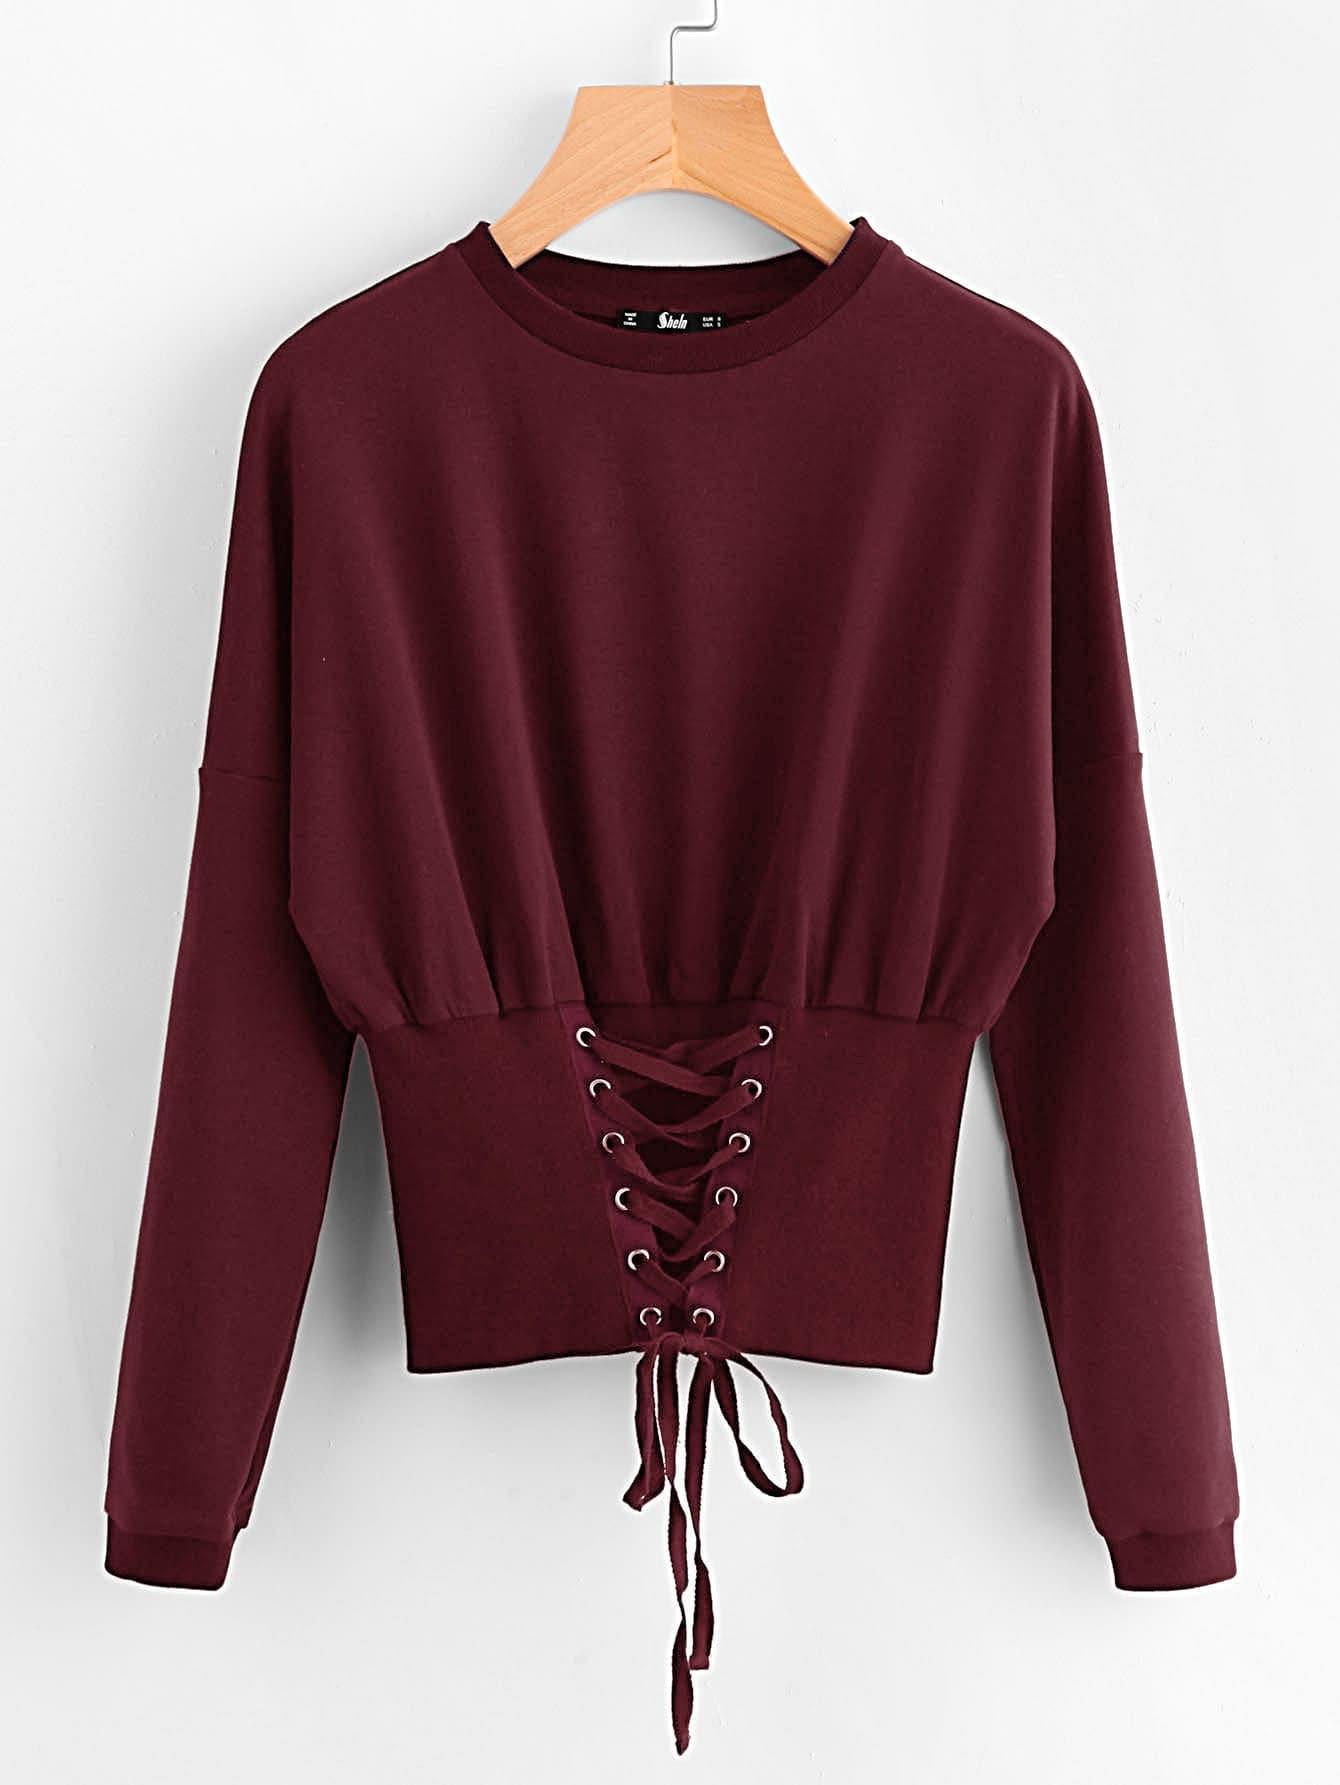 Grommet Lace Up Wide Hem Sweatshirt grommet lace up marled knit crop sweatshirt